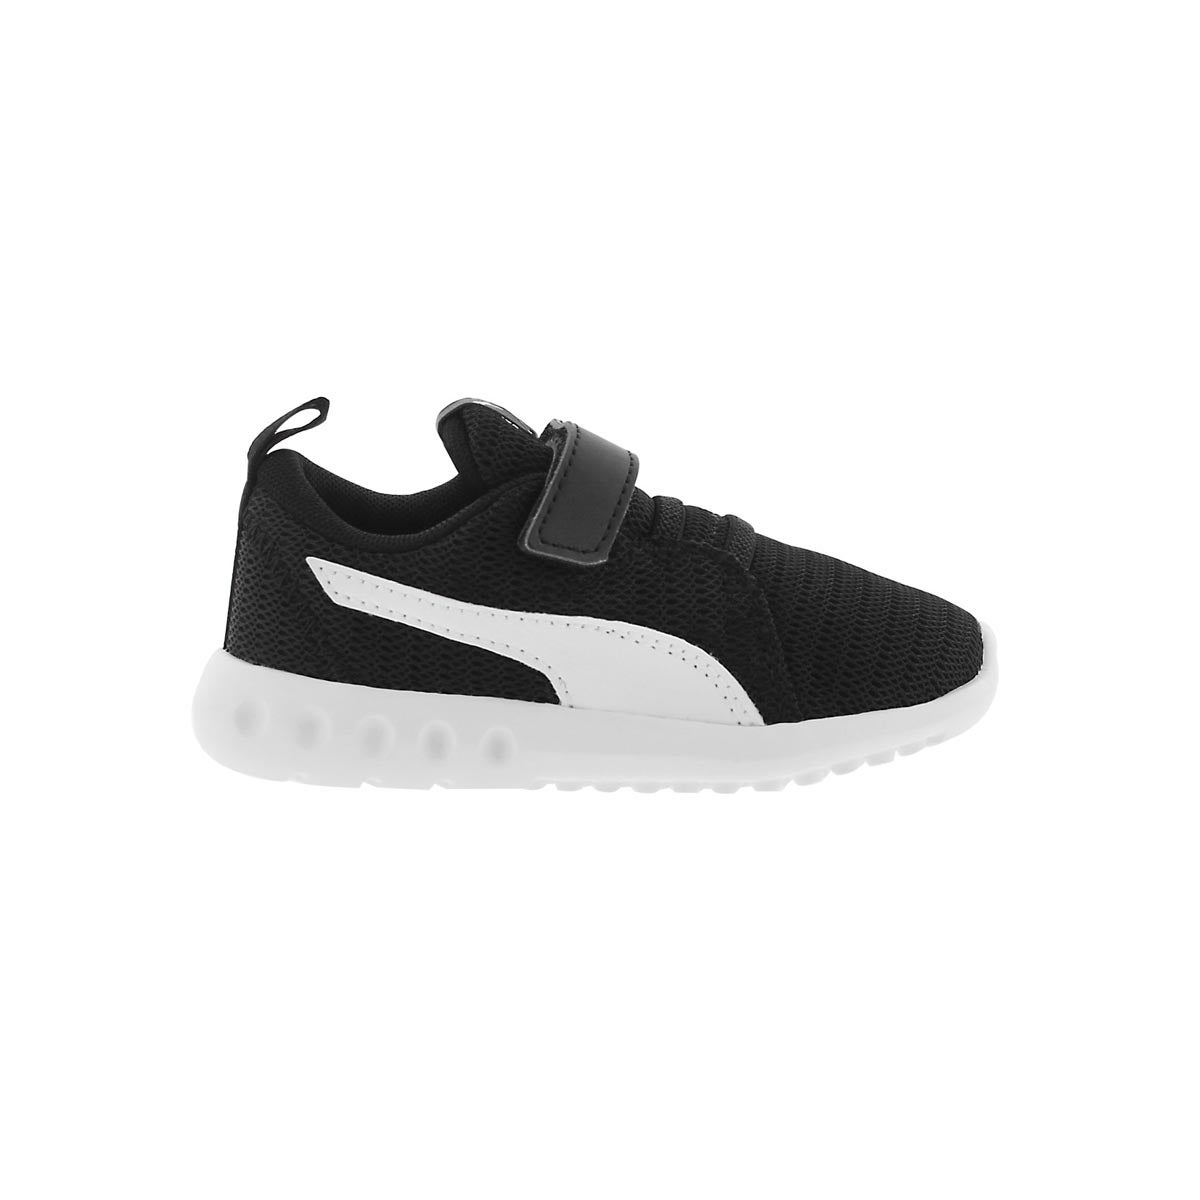 Inf-b Carson 2 V black sneaker